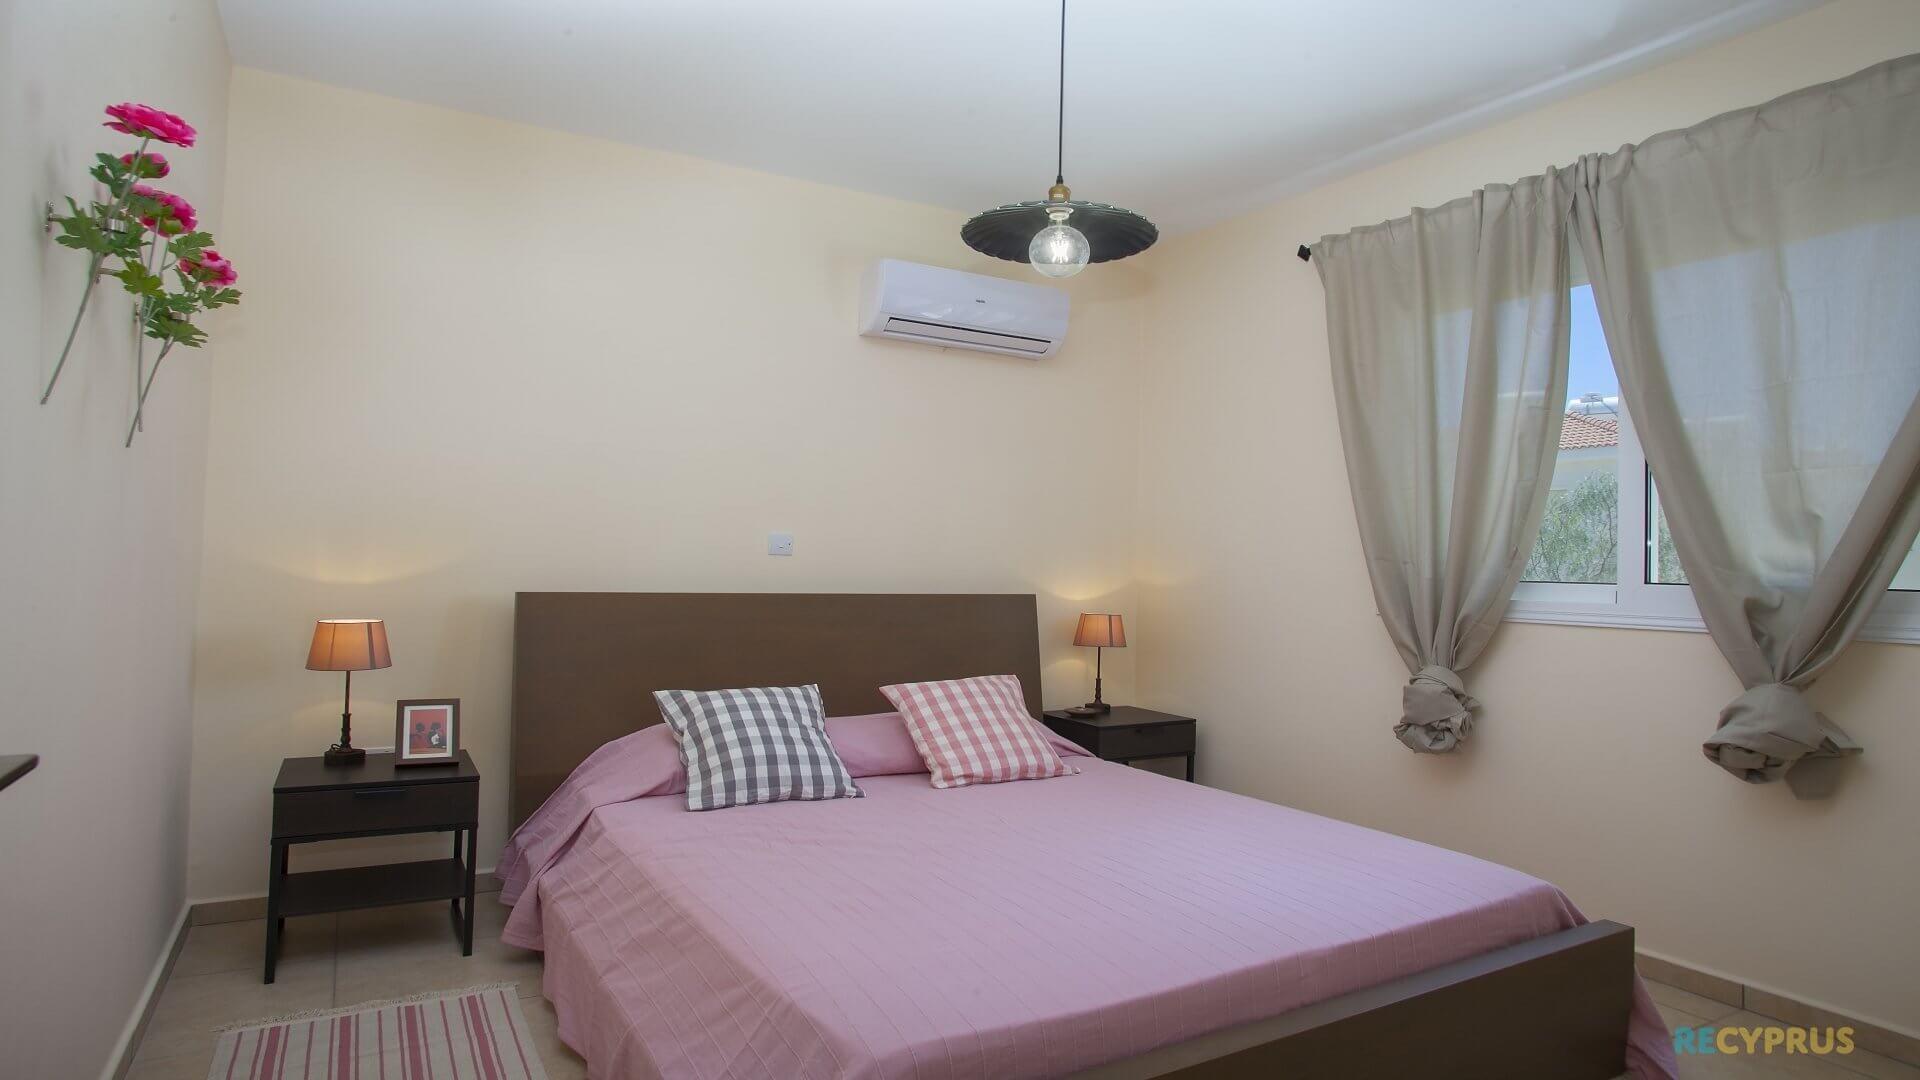 Apartment for sale Kapparis Famagusta Cyprus 5 3442